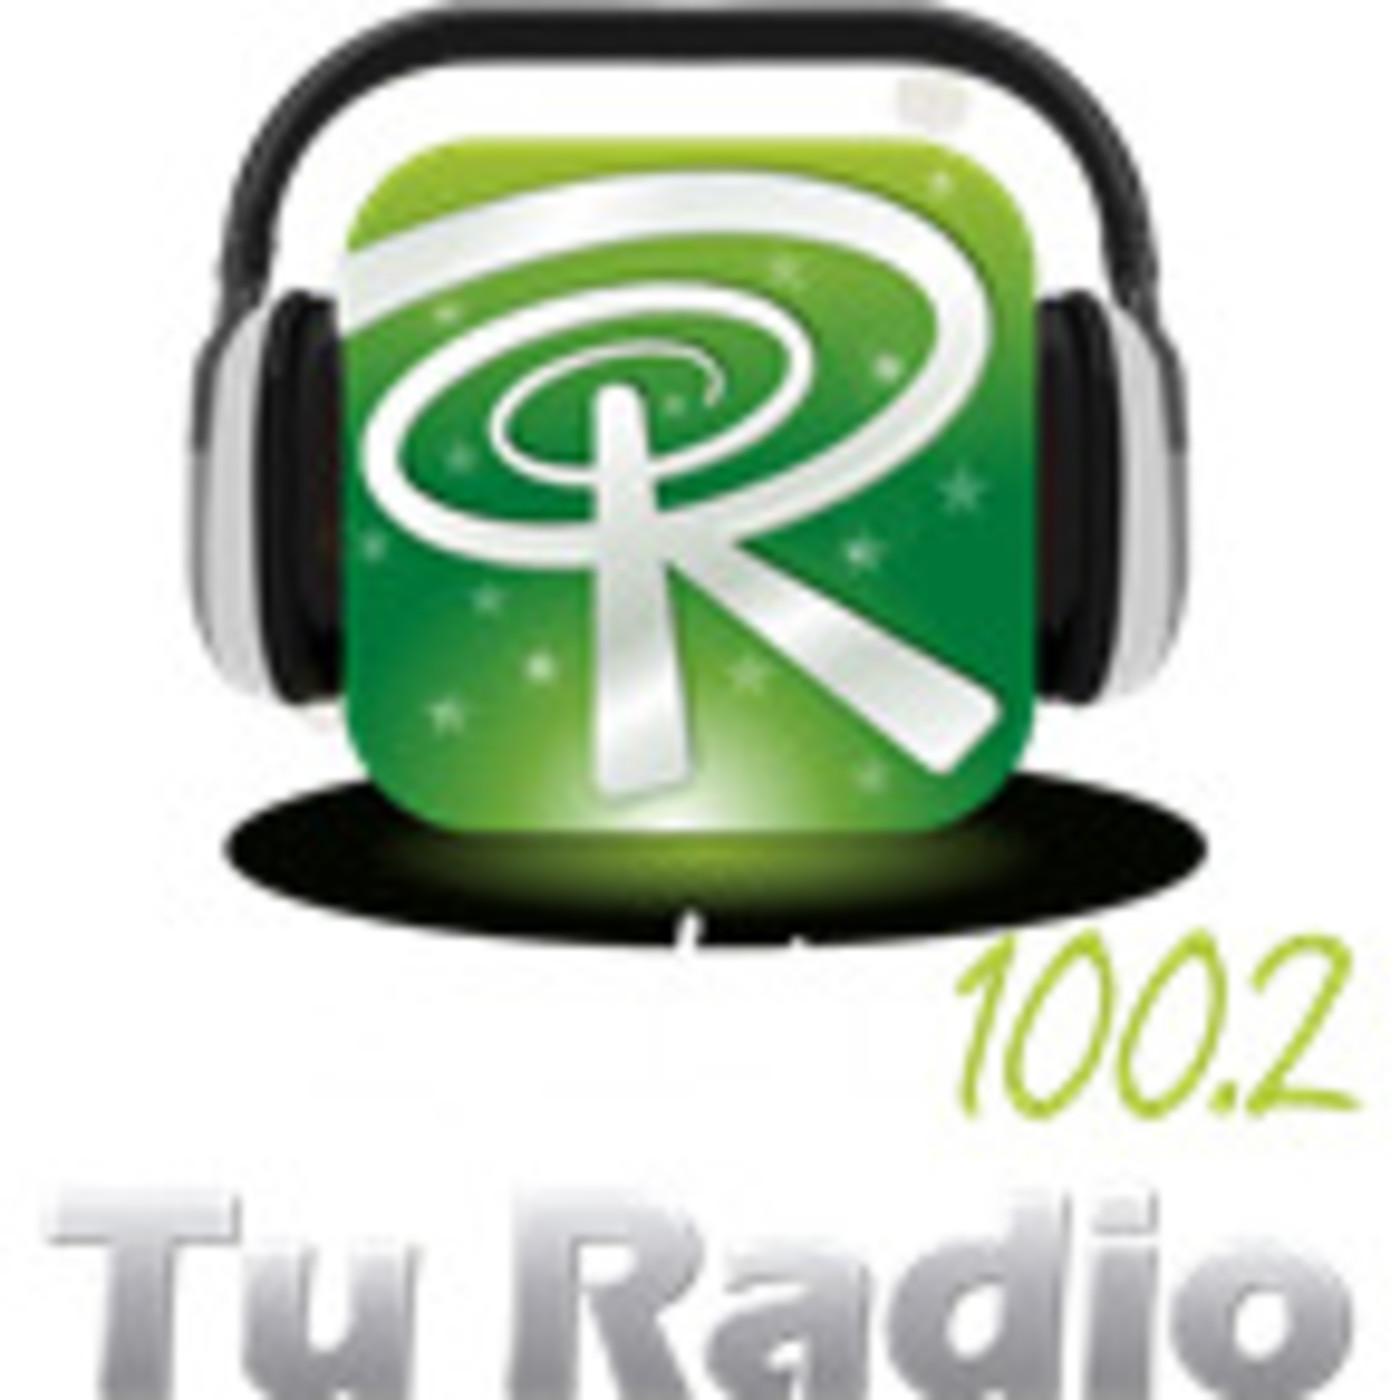 RISARALDA 100.2 TU RADIO